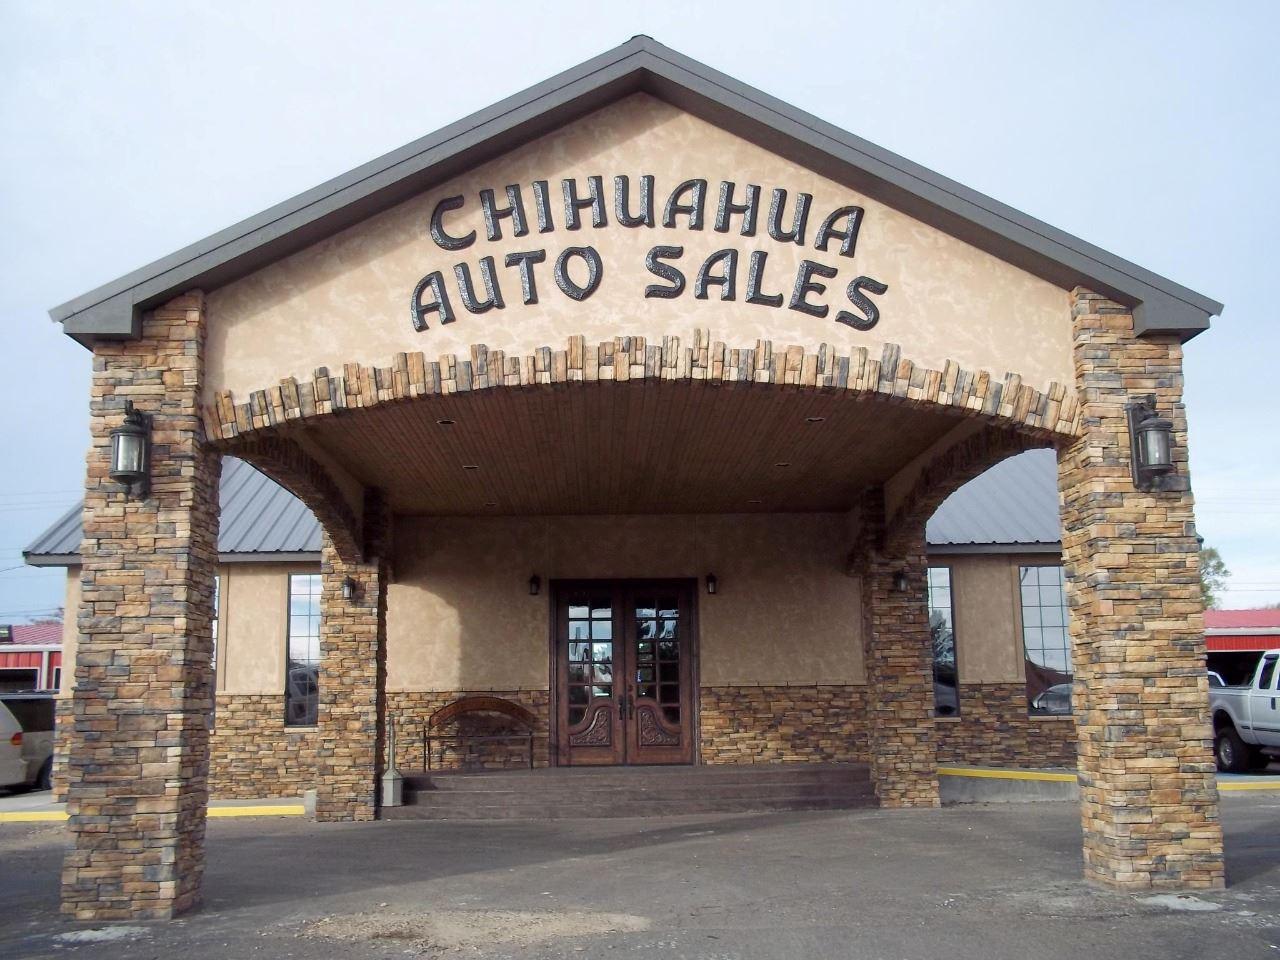 Chihuahua Auto Sales